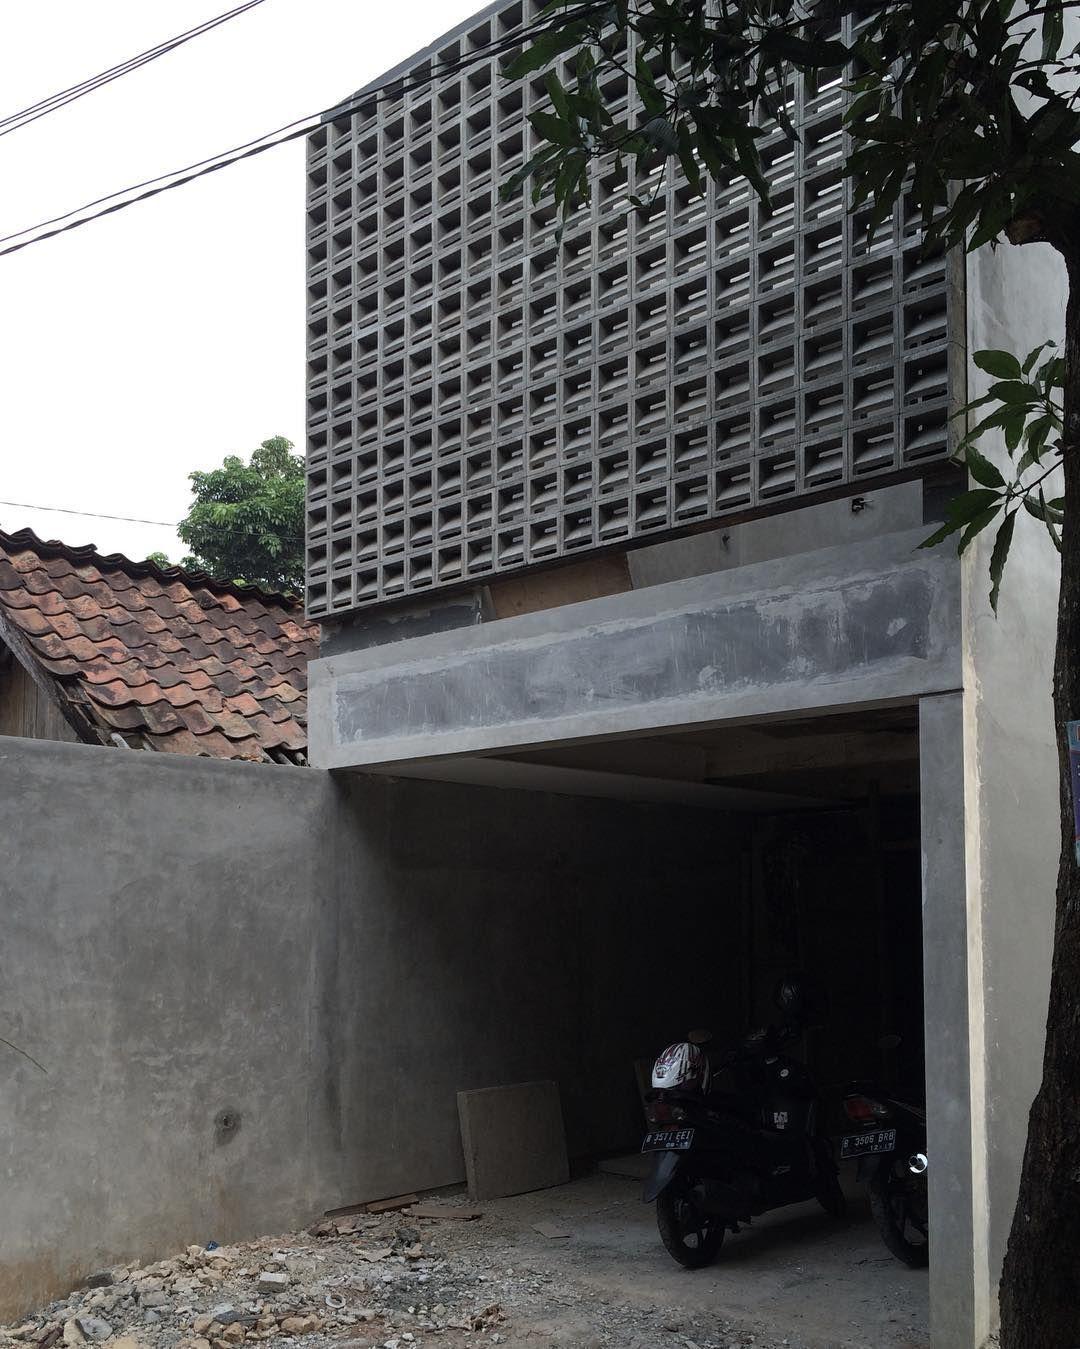 Modern Smallhouse Home: Sitting On The Wall #ventblocks # Smallhouse